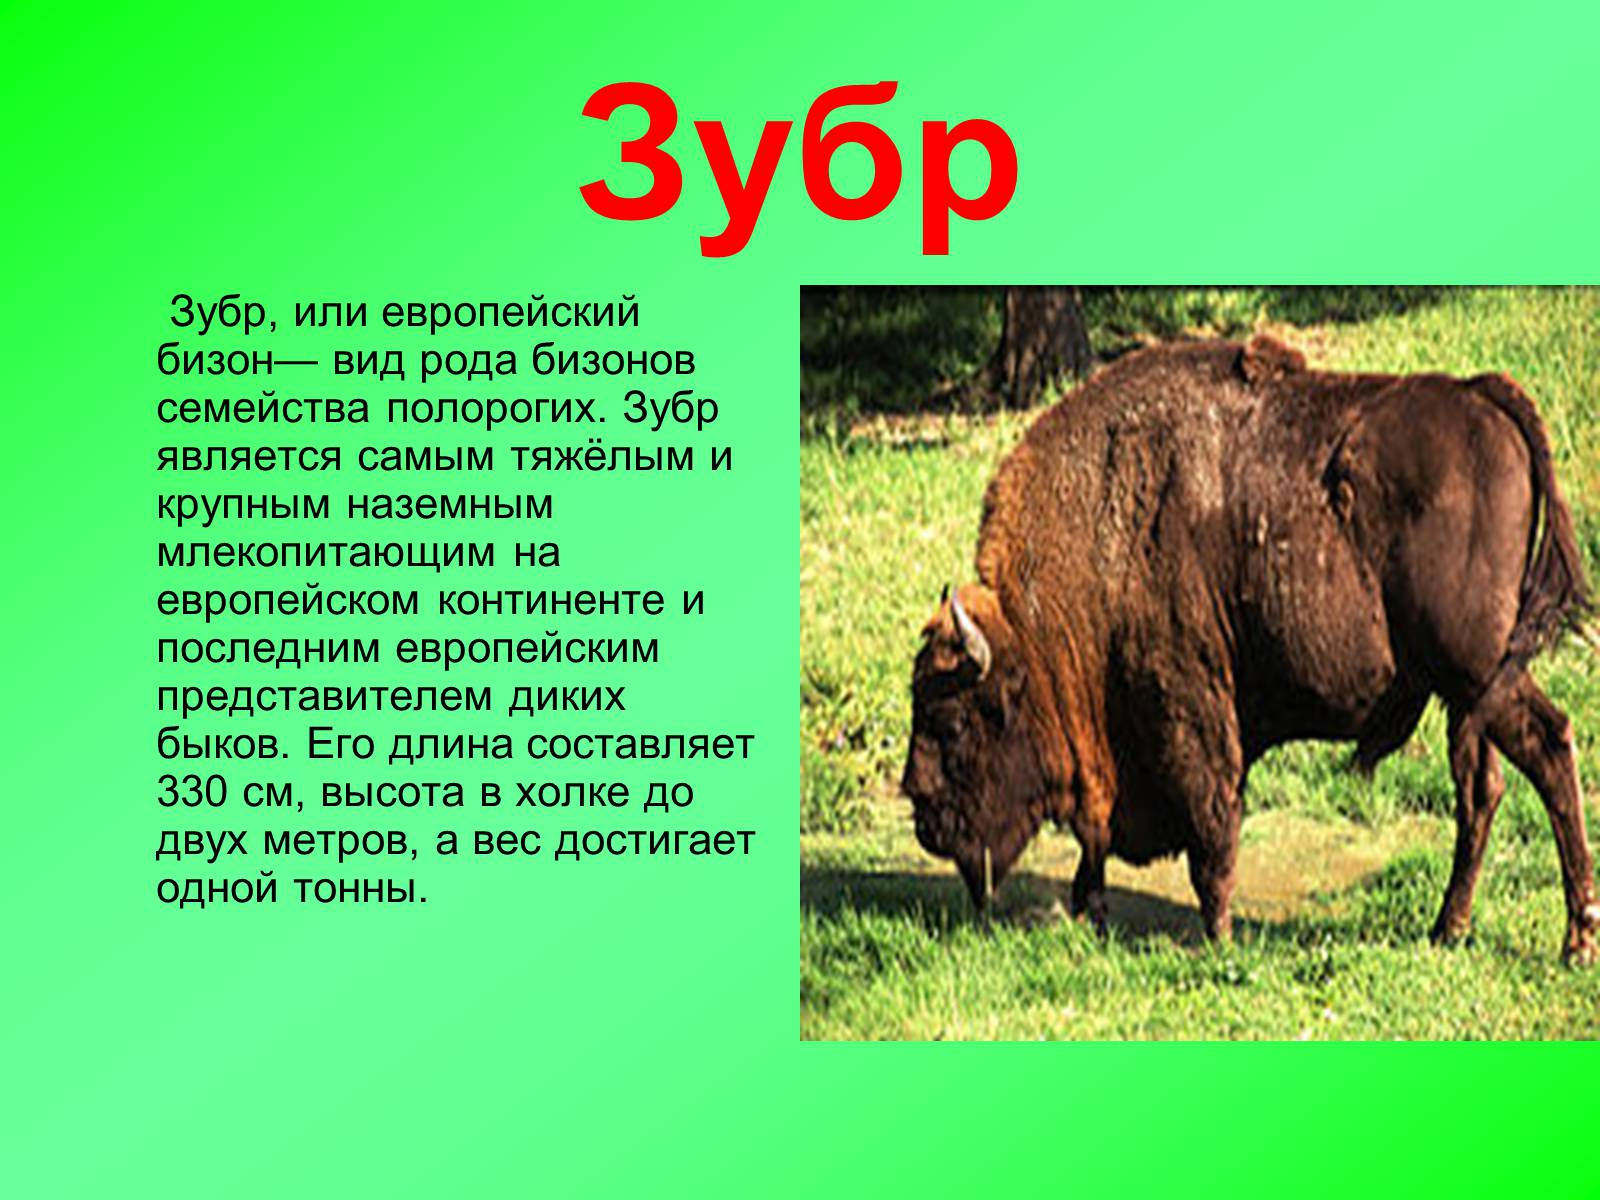 Фото и описание животного россии член